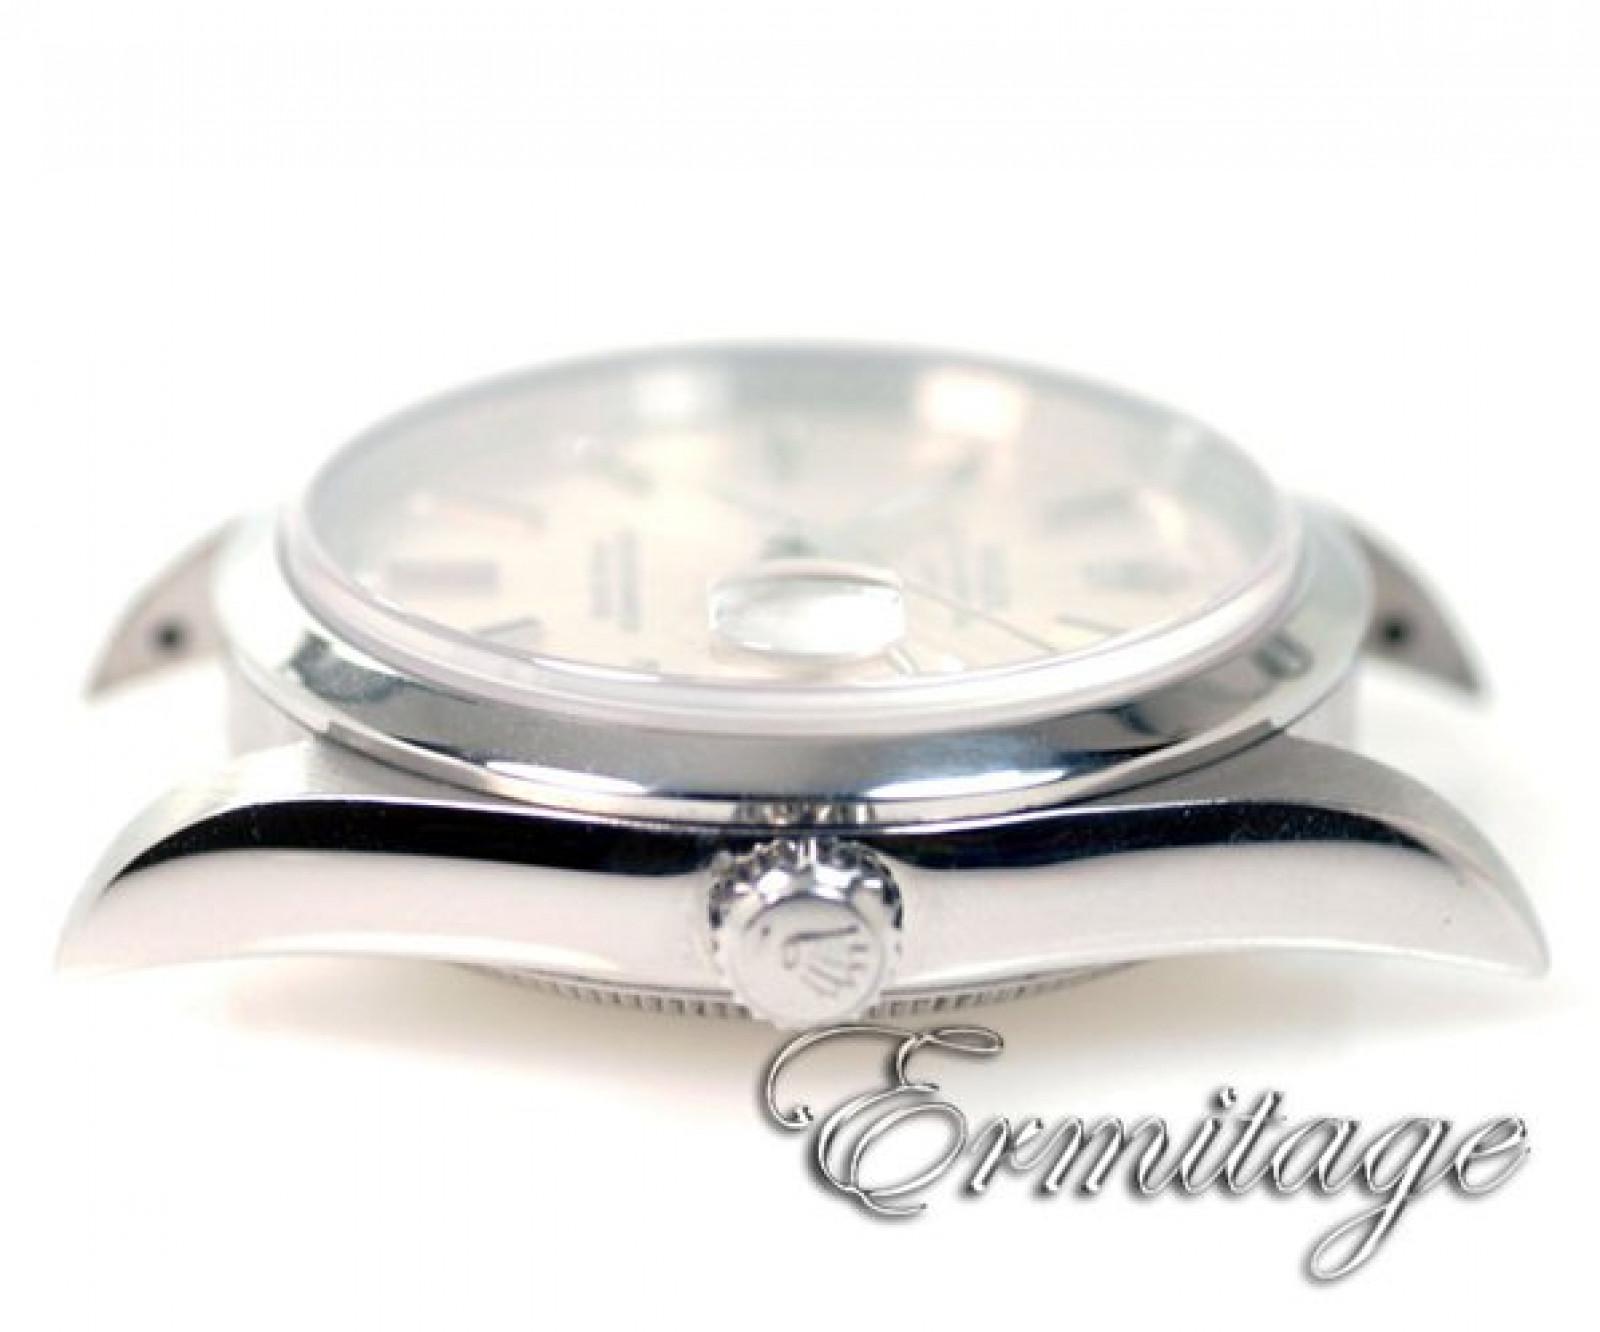 Rolex Date 15200 Steel Silver Dial 1999